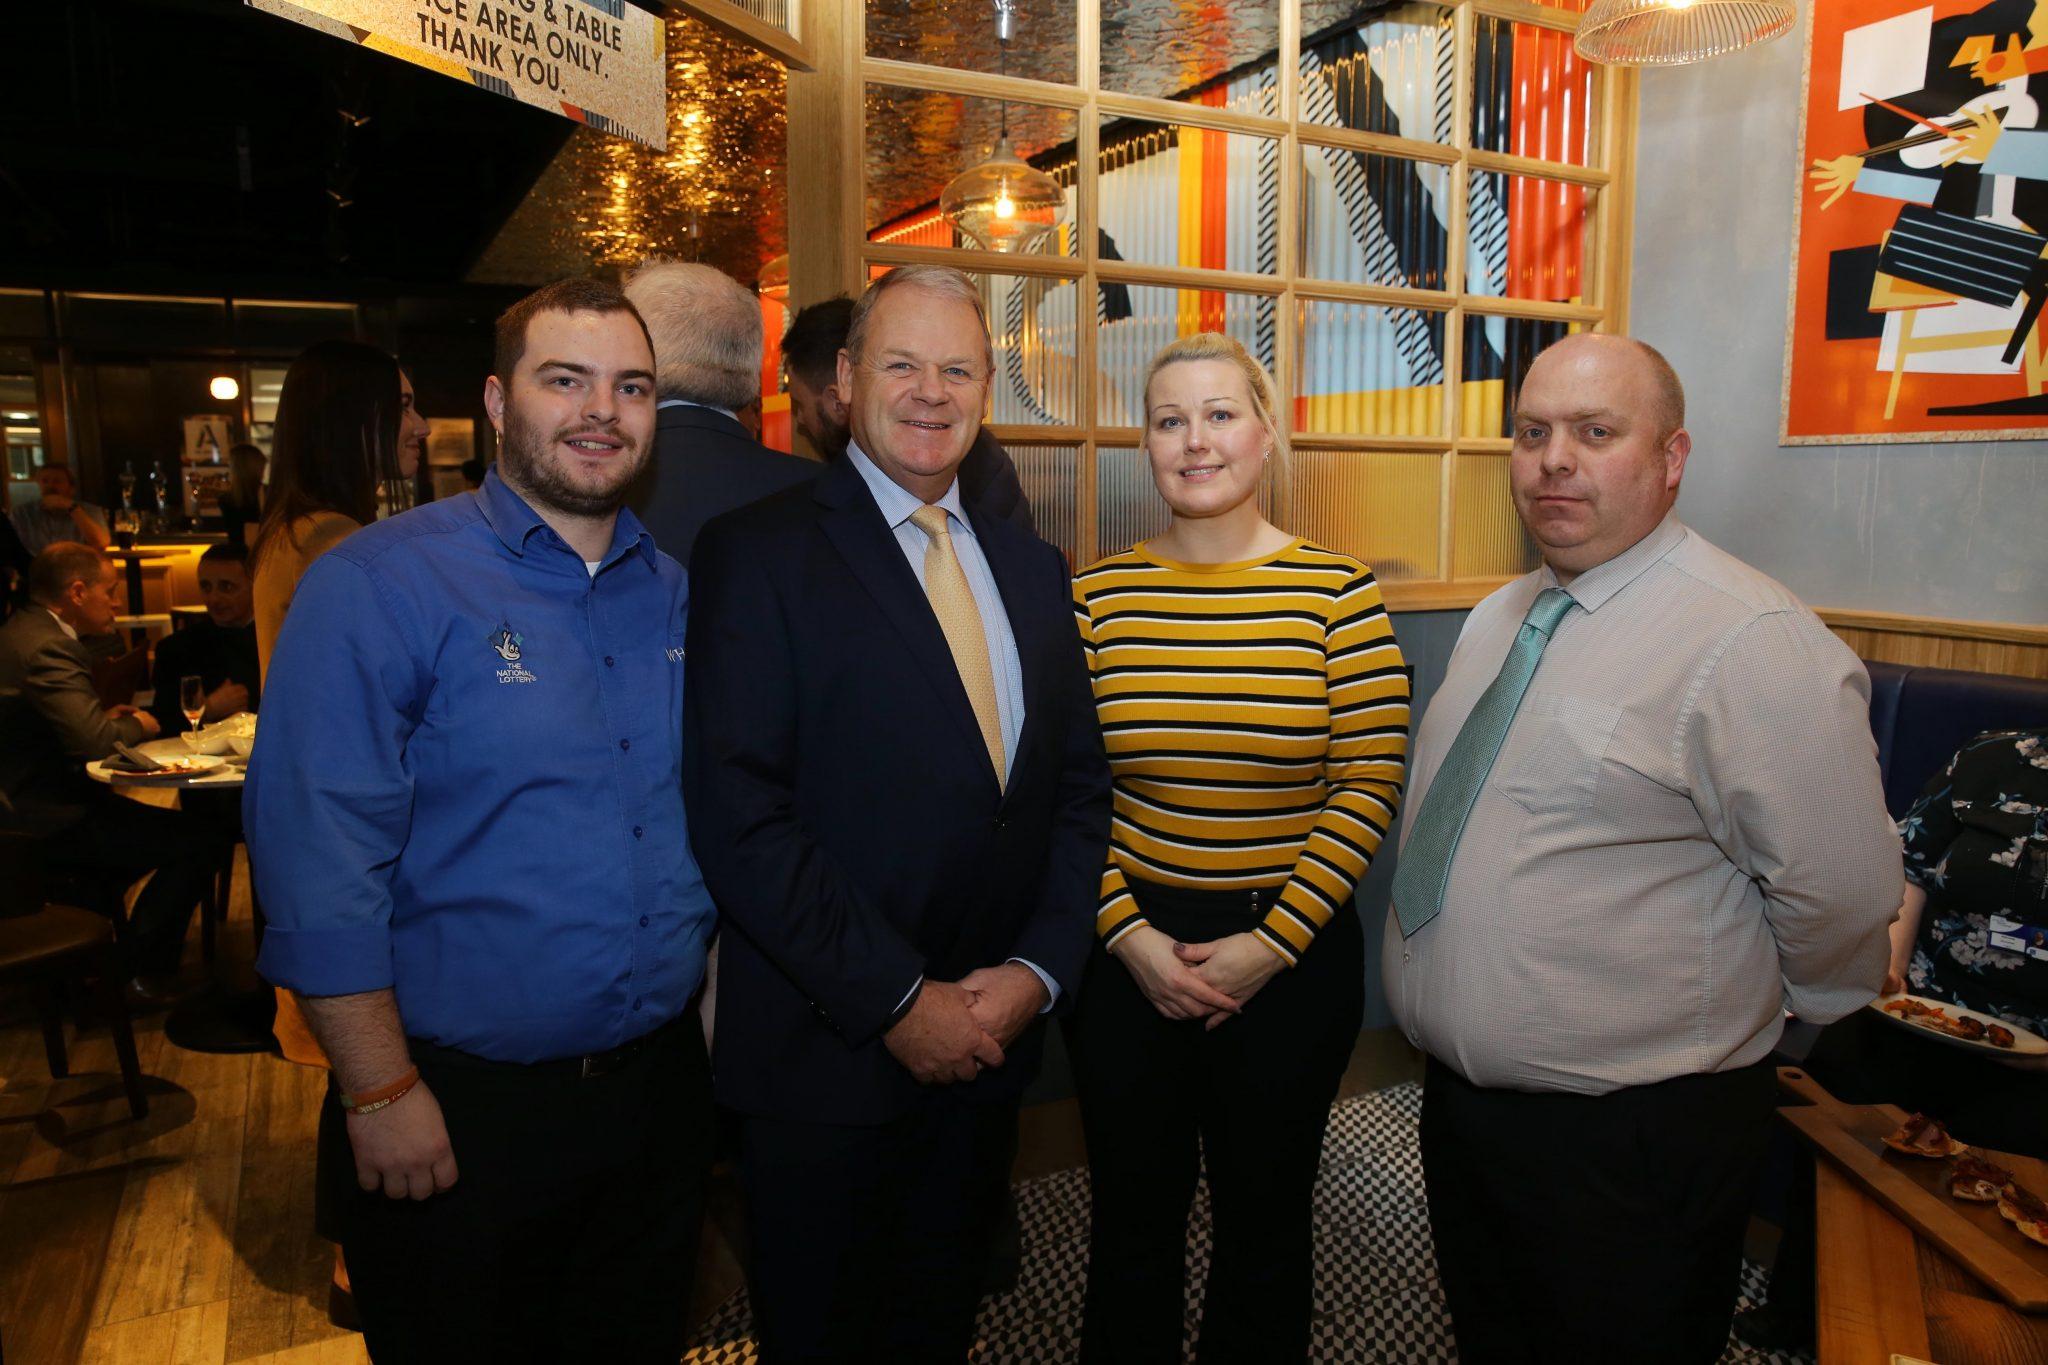 Belfast City unveils a £15m revamp